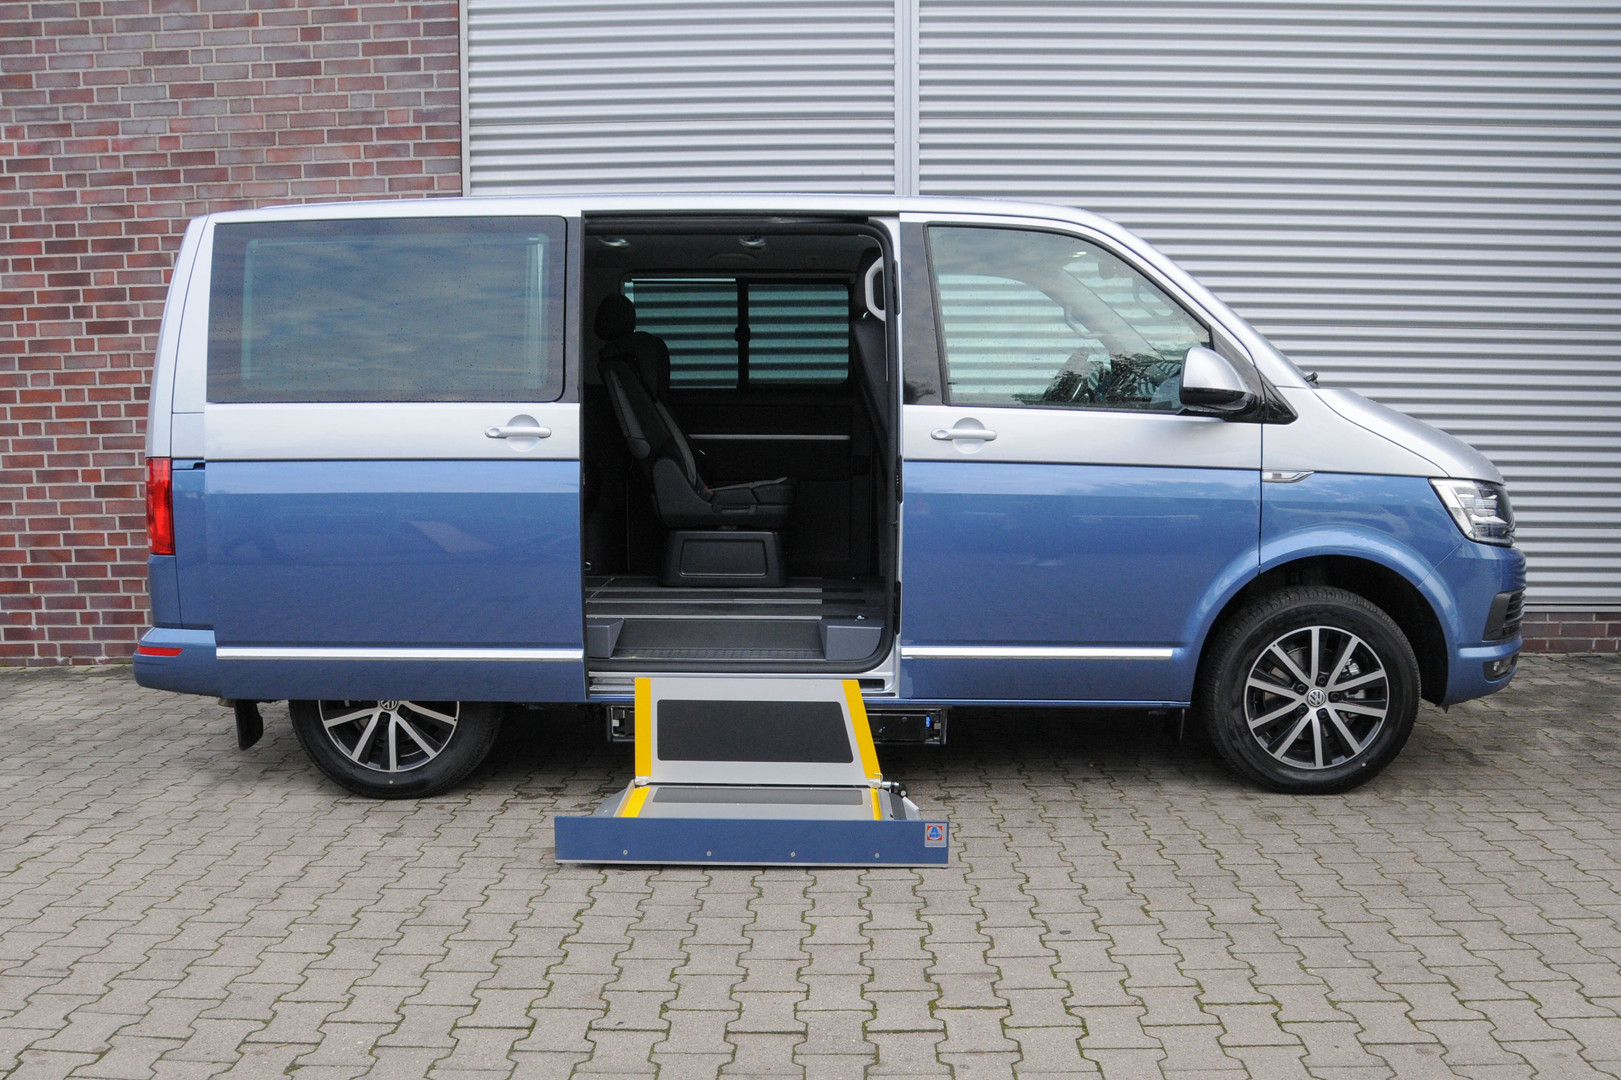 AMF-Bruns_VW T6_K90 ACTIVE (6).jpg